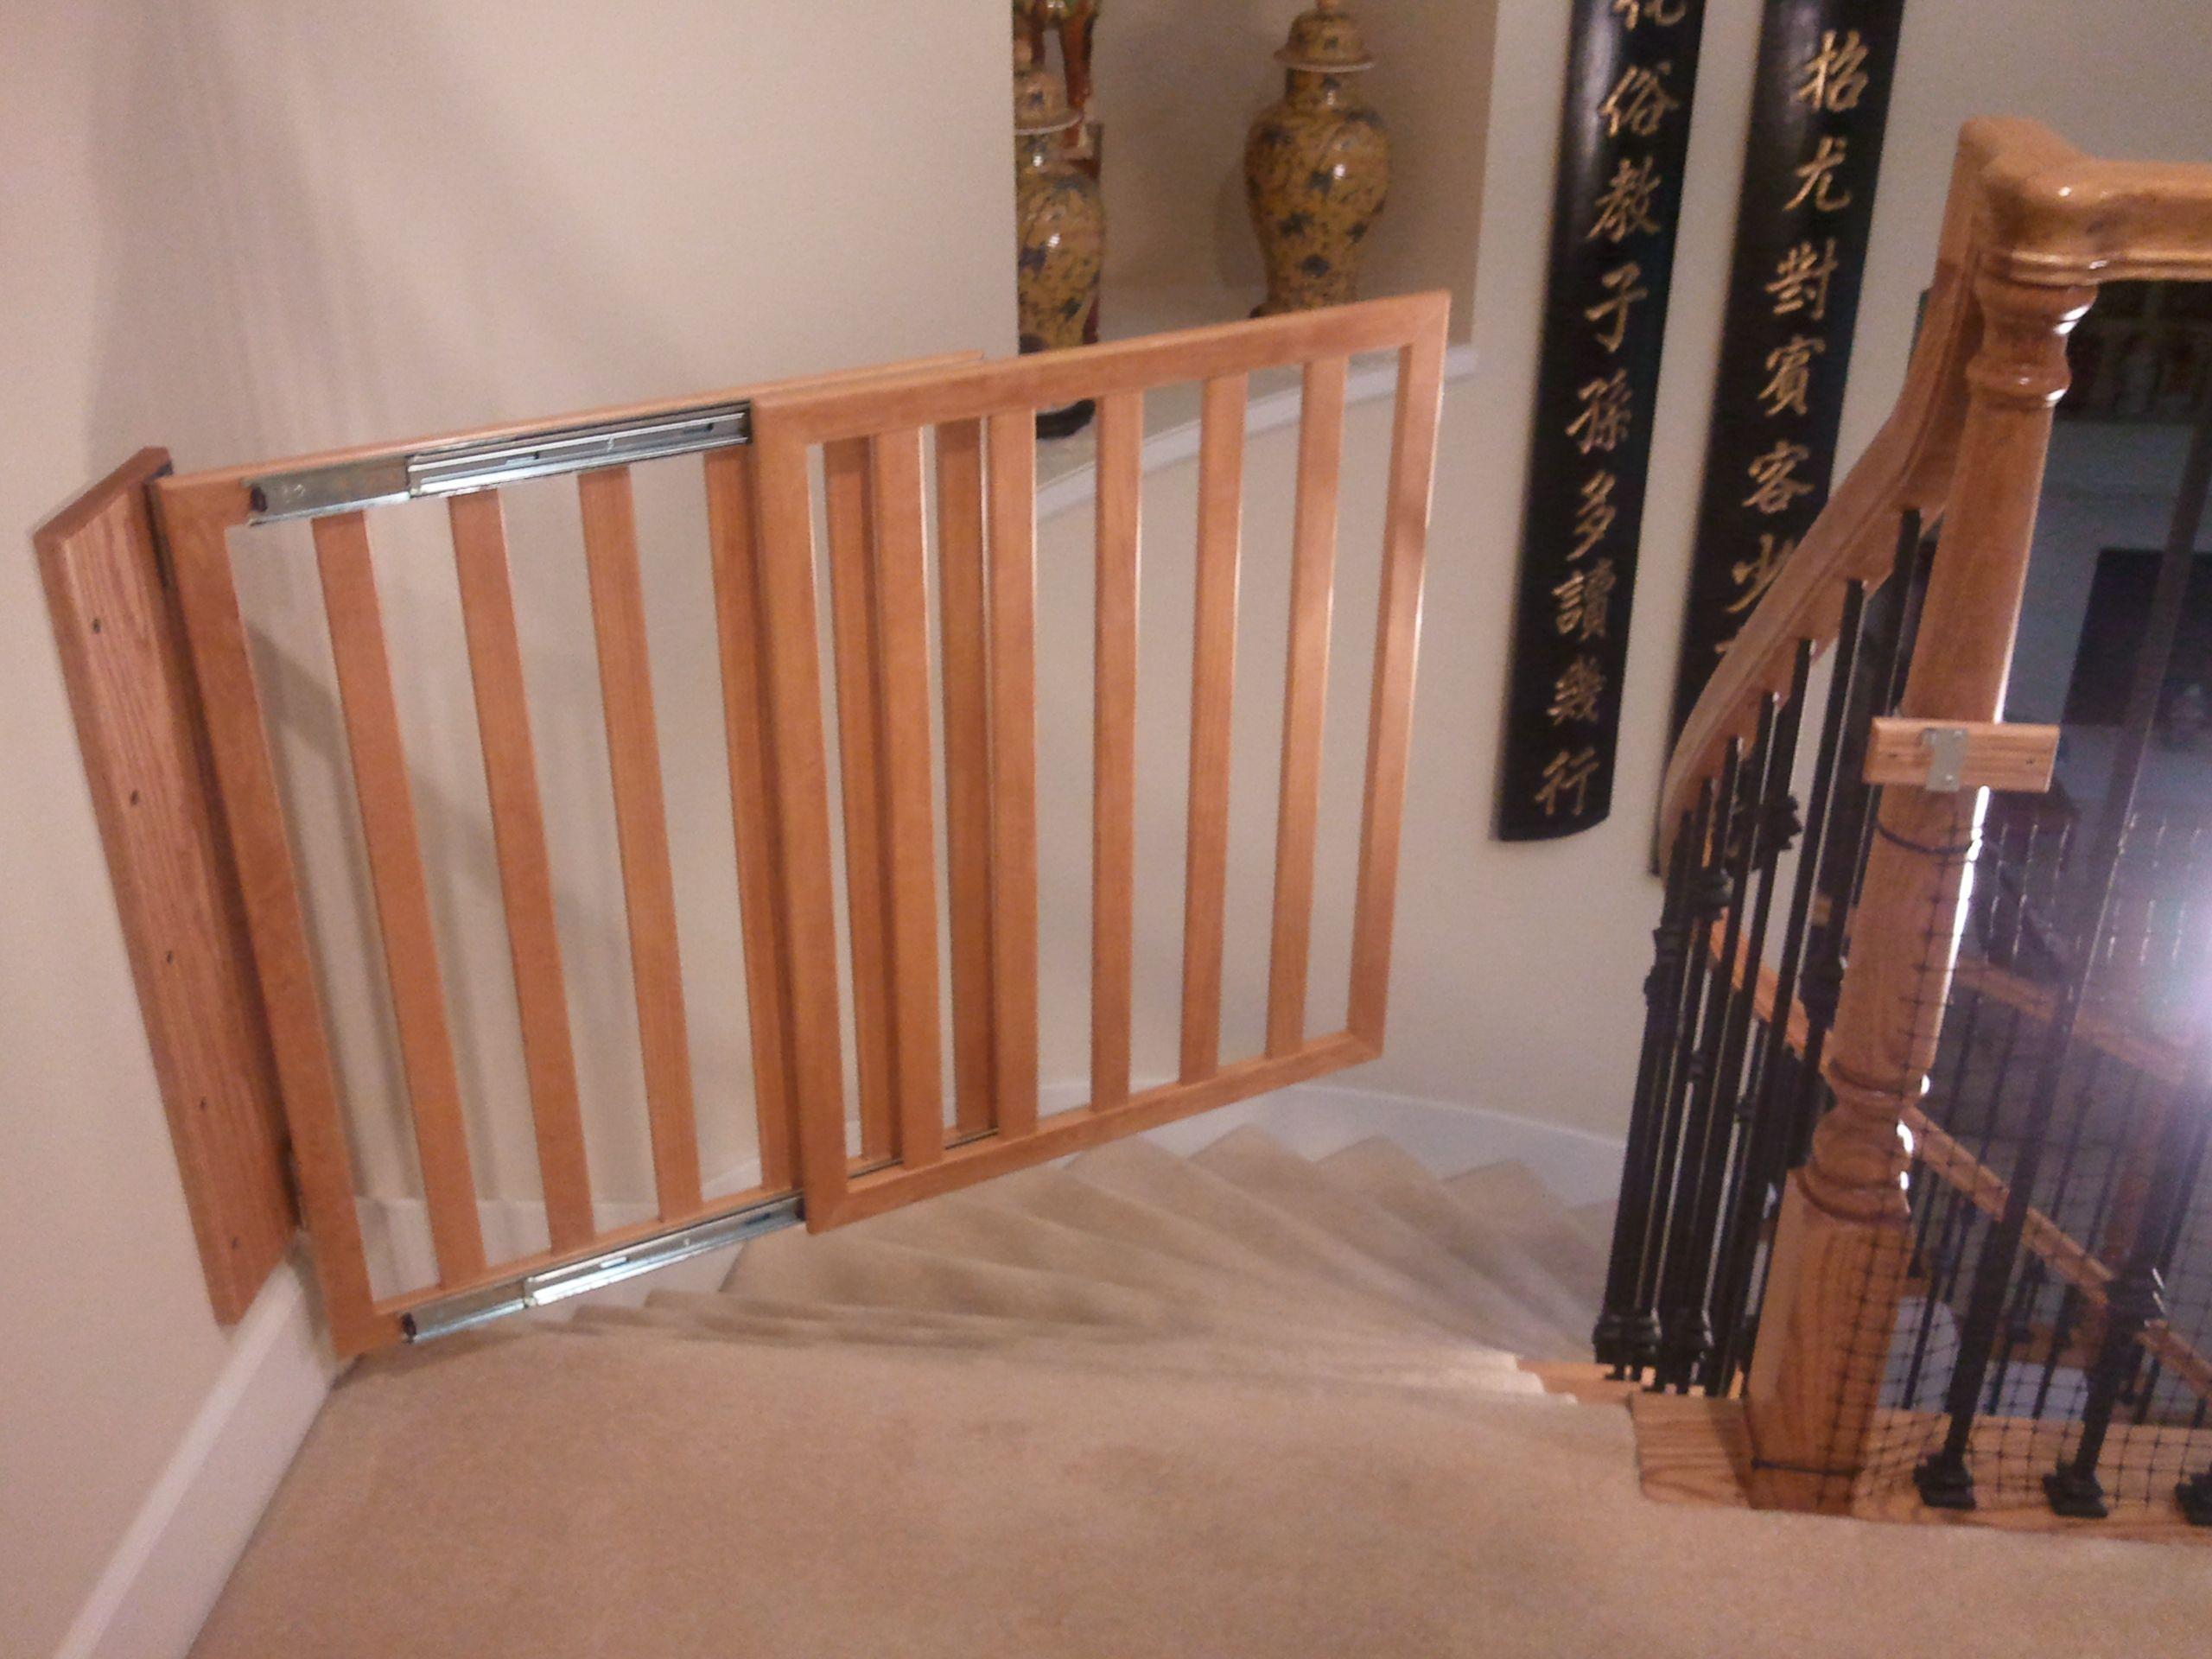 41 solid design wooden baby gate wooden baby gates diy